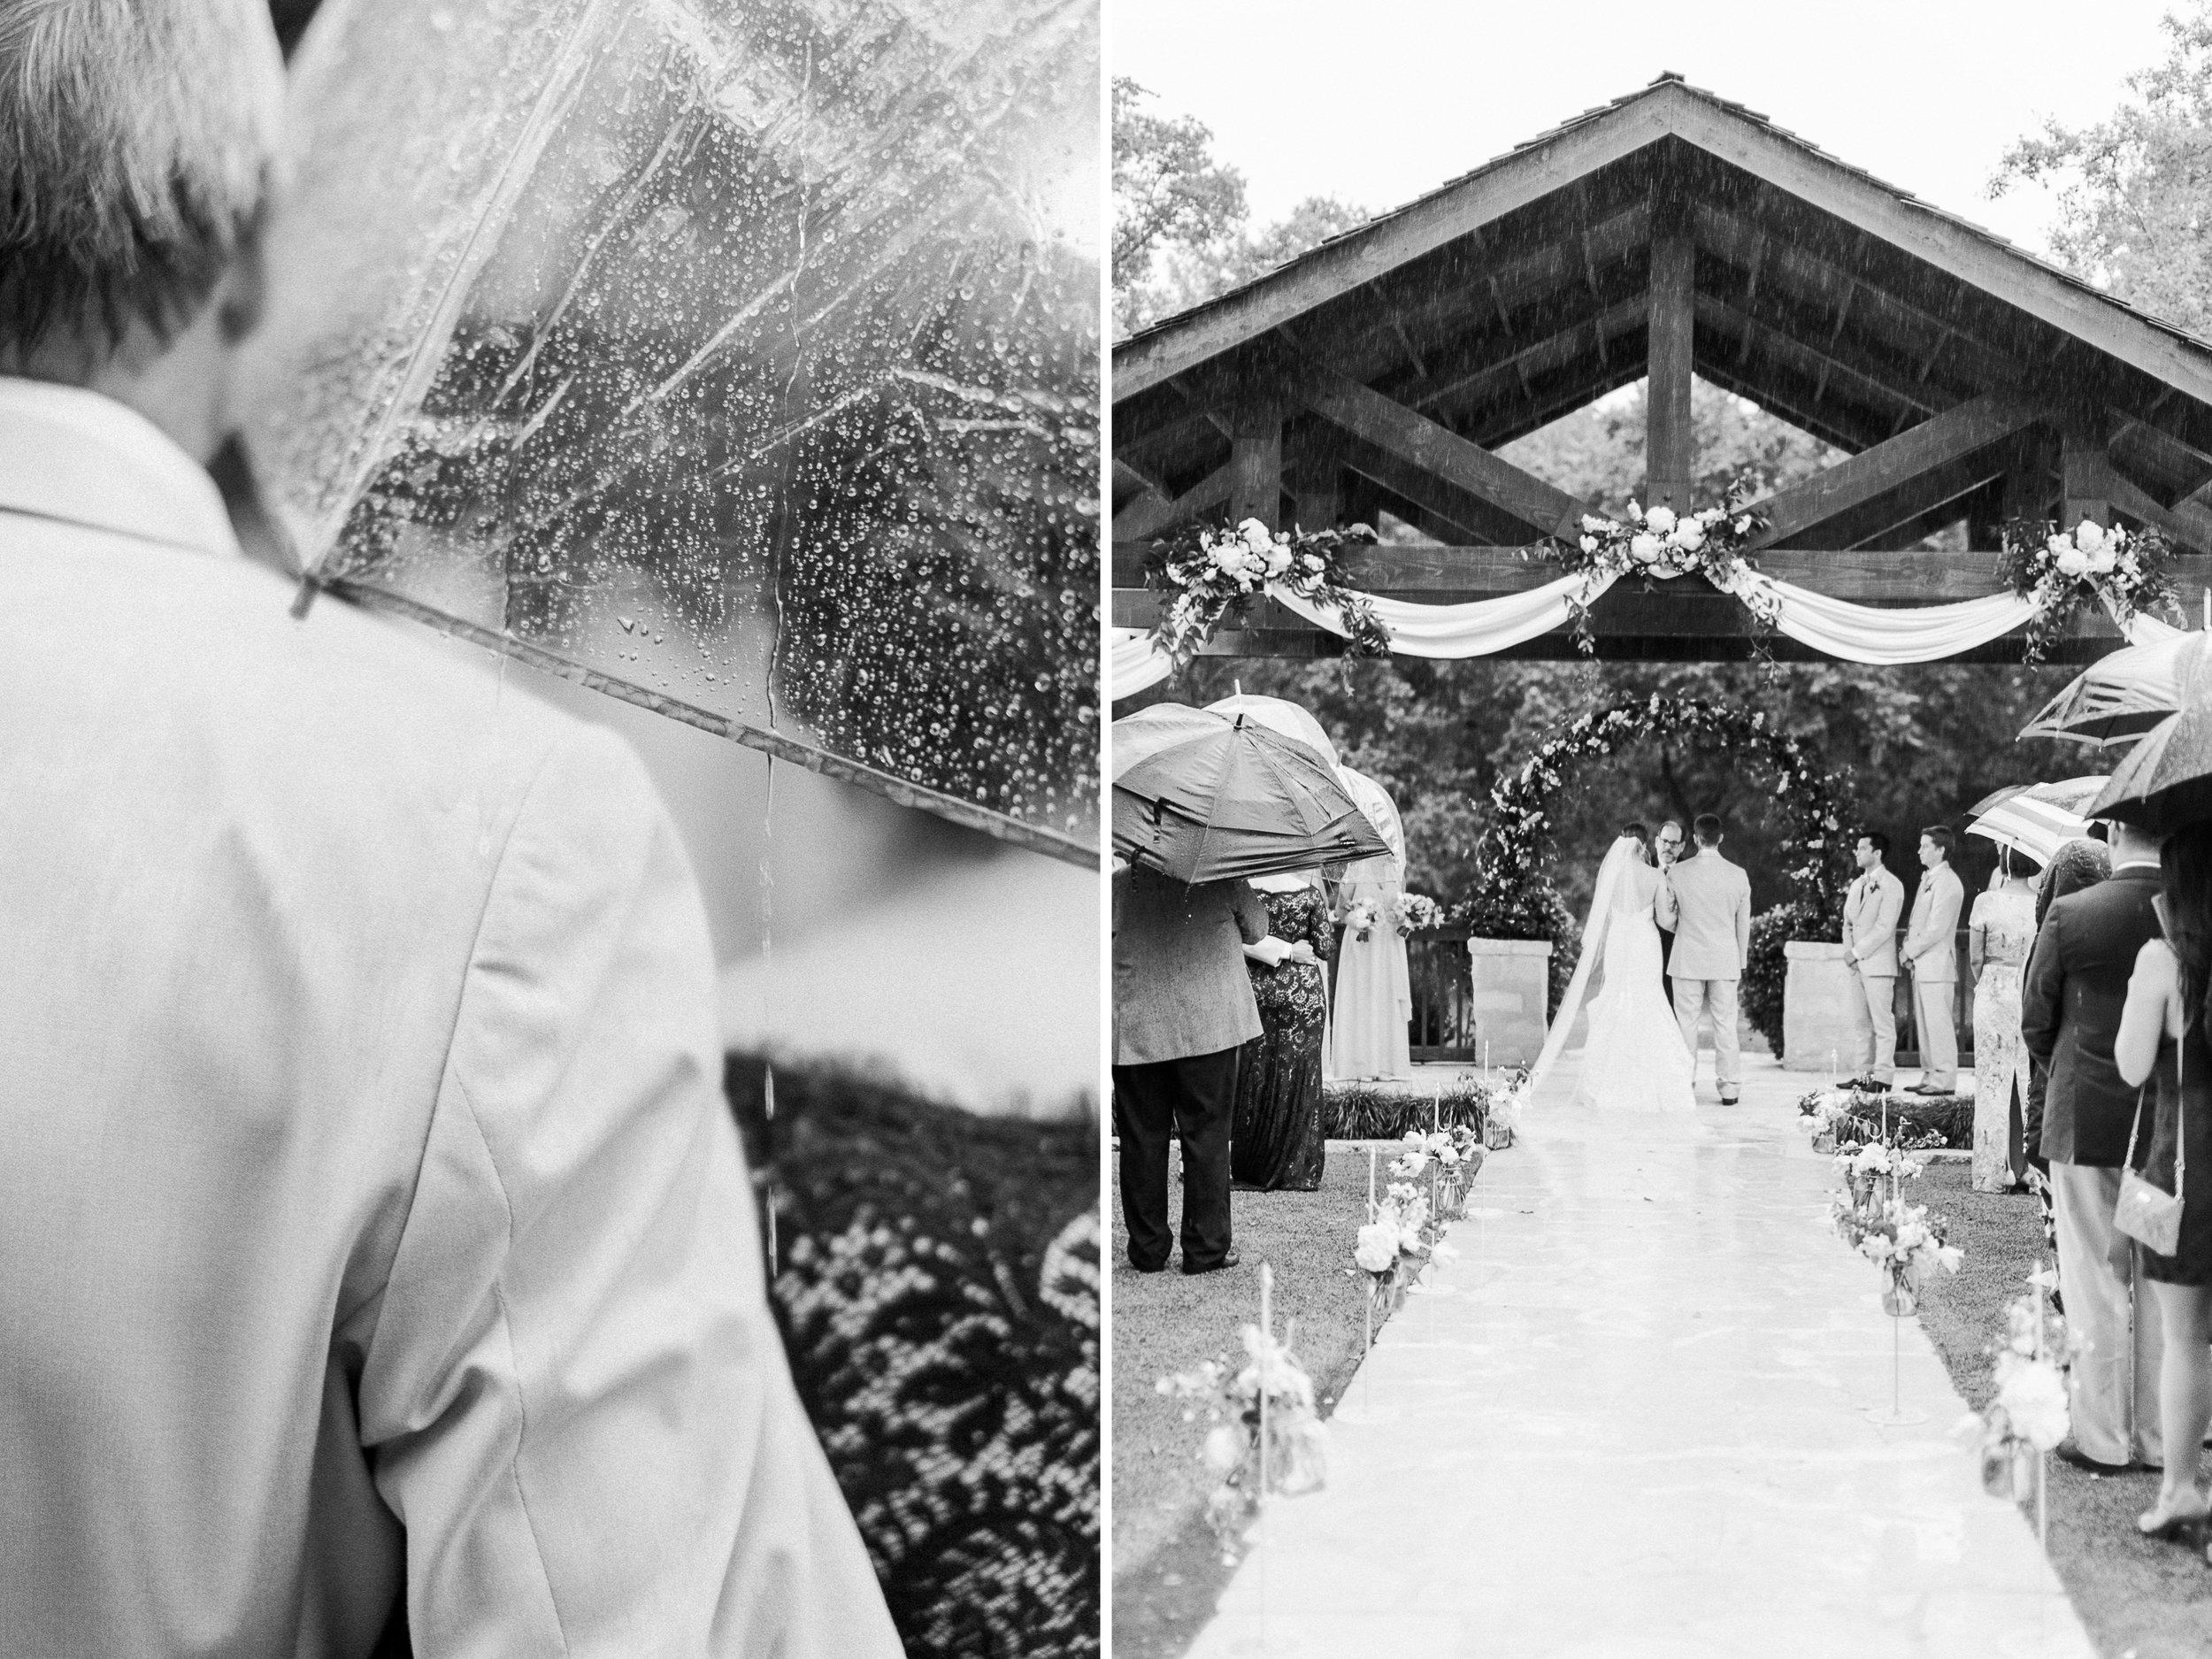 The-Knot-Wedding-Houston-Photographer-Fine-Art-Dana-Fernandez-Photography-Film-131.jpg